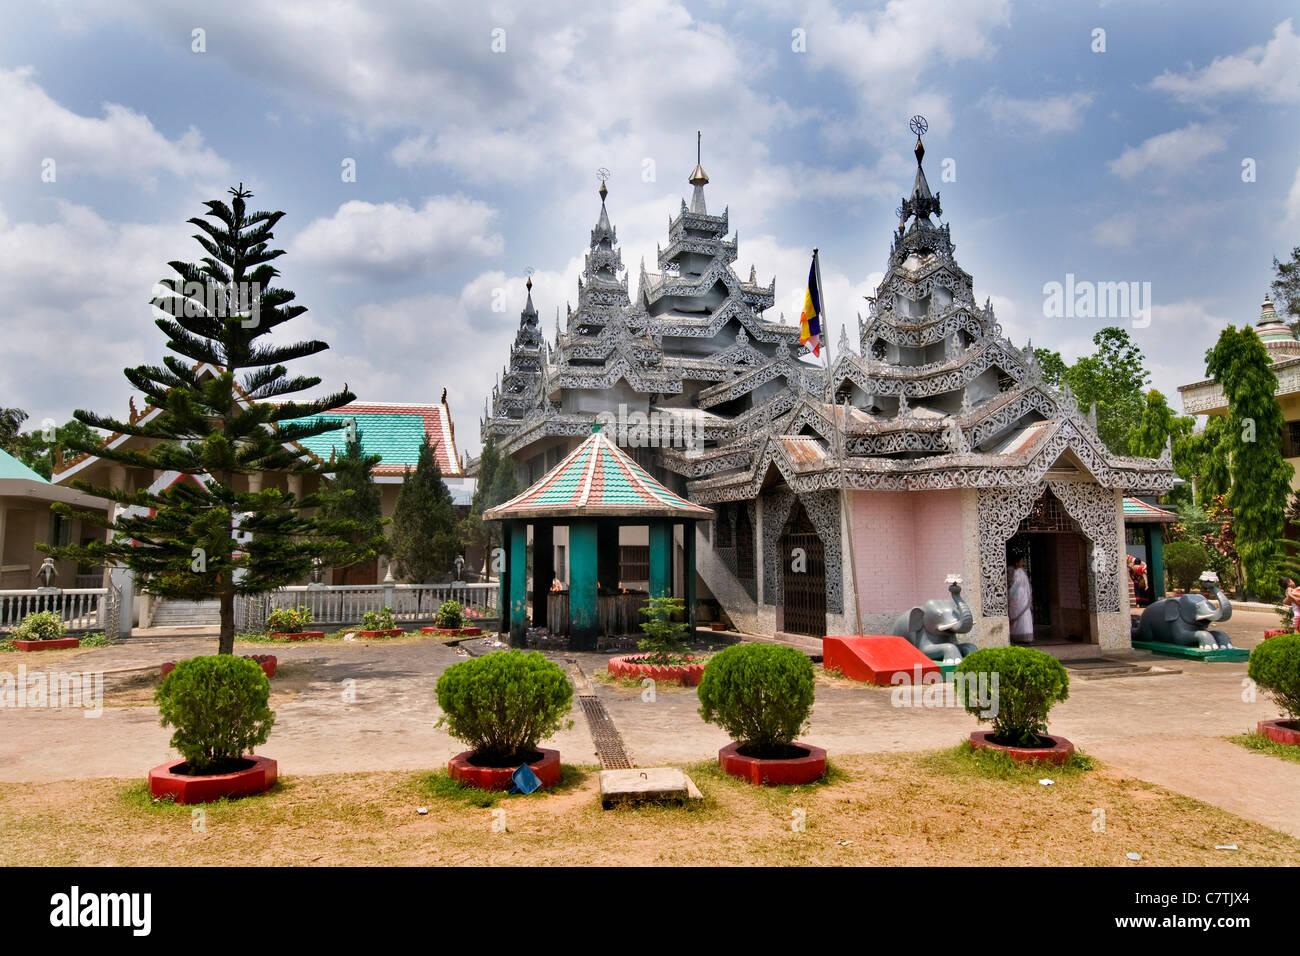 Bangladesh, Rajshashi, buddhist monastery - Stock Image